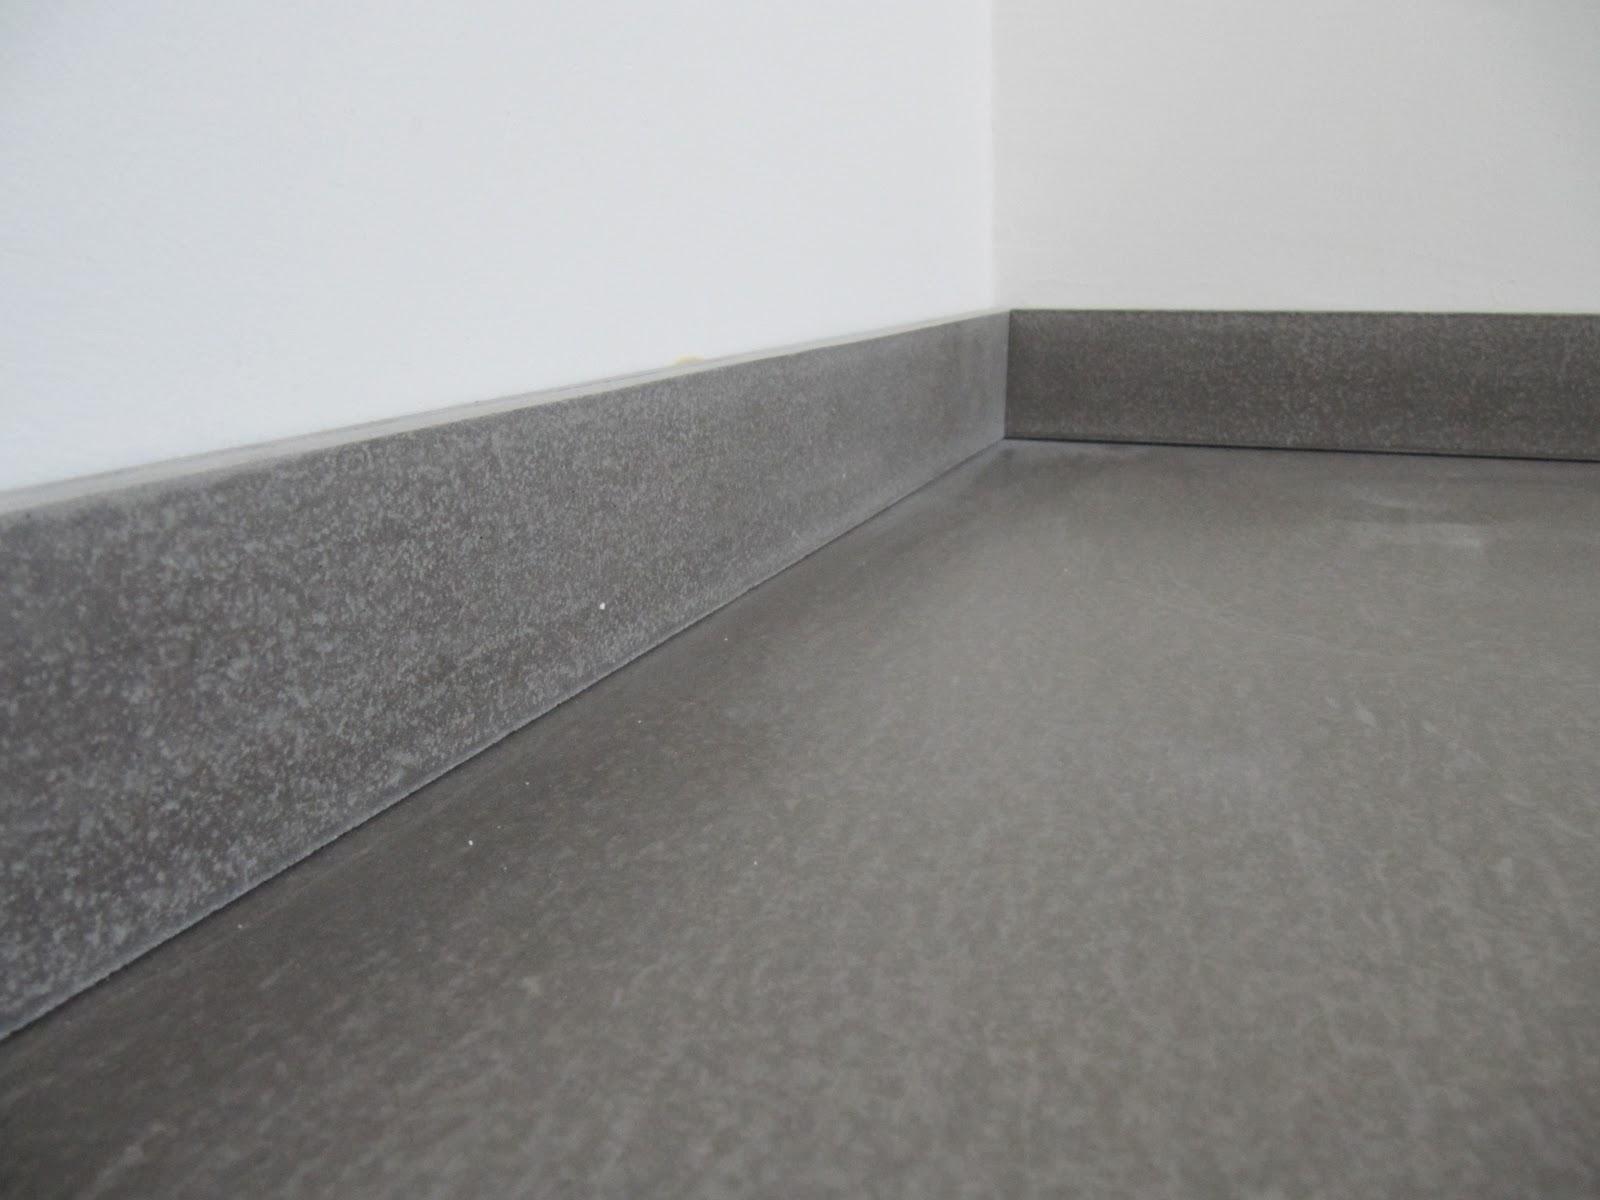 Fußboden In Betonoptik – Wohn-Design